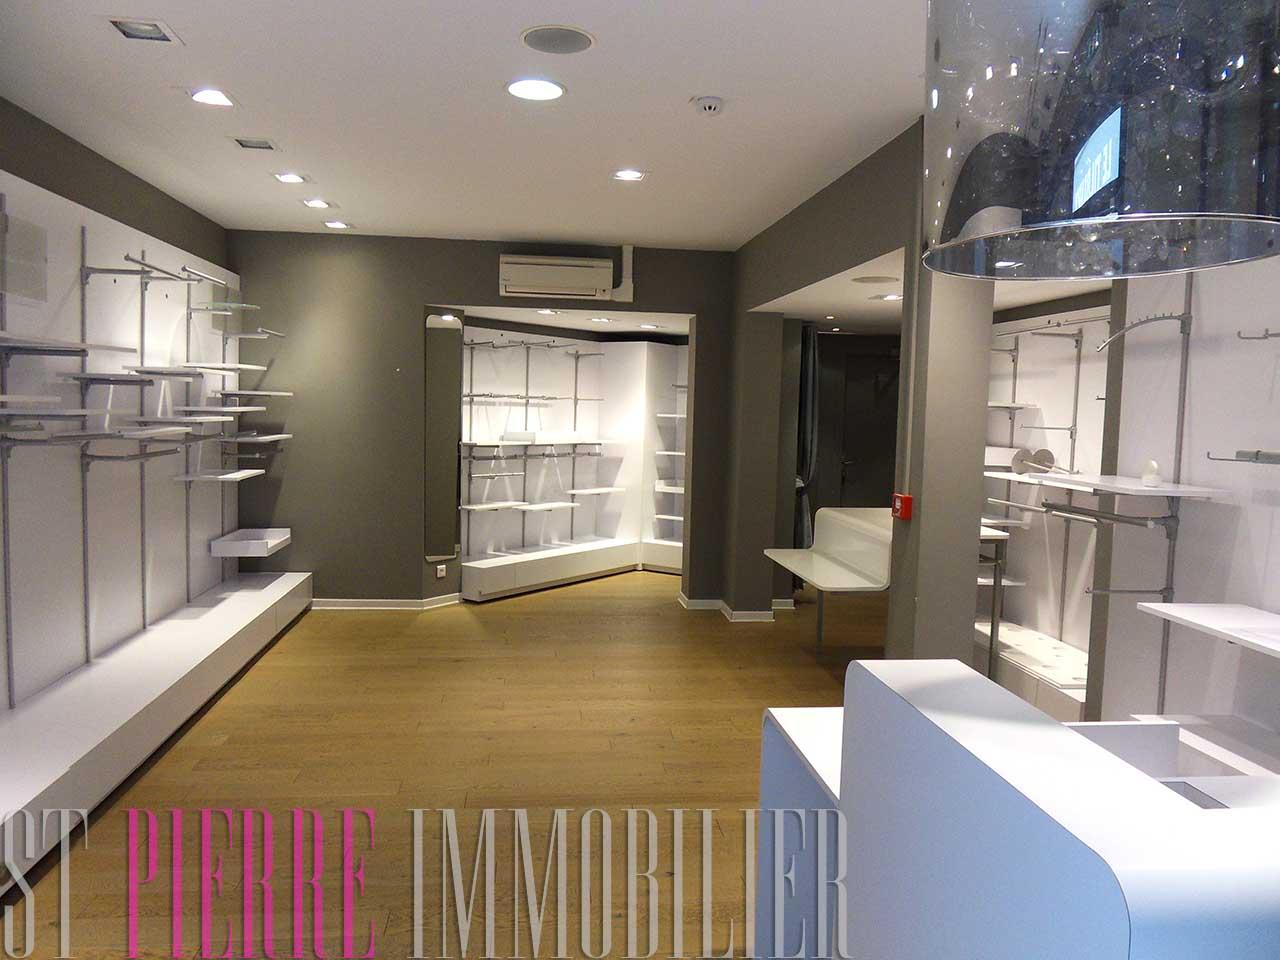 location local commercial passage du commerce niort st pierre immobilier niort. Black Bedroom Furniture Sets. Home Design Ideas